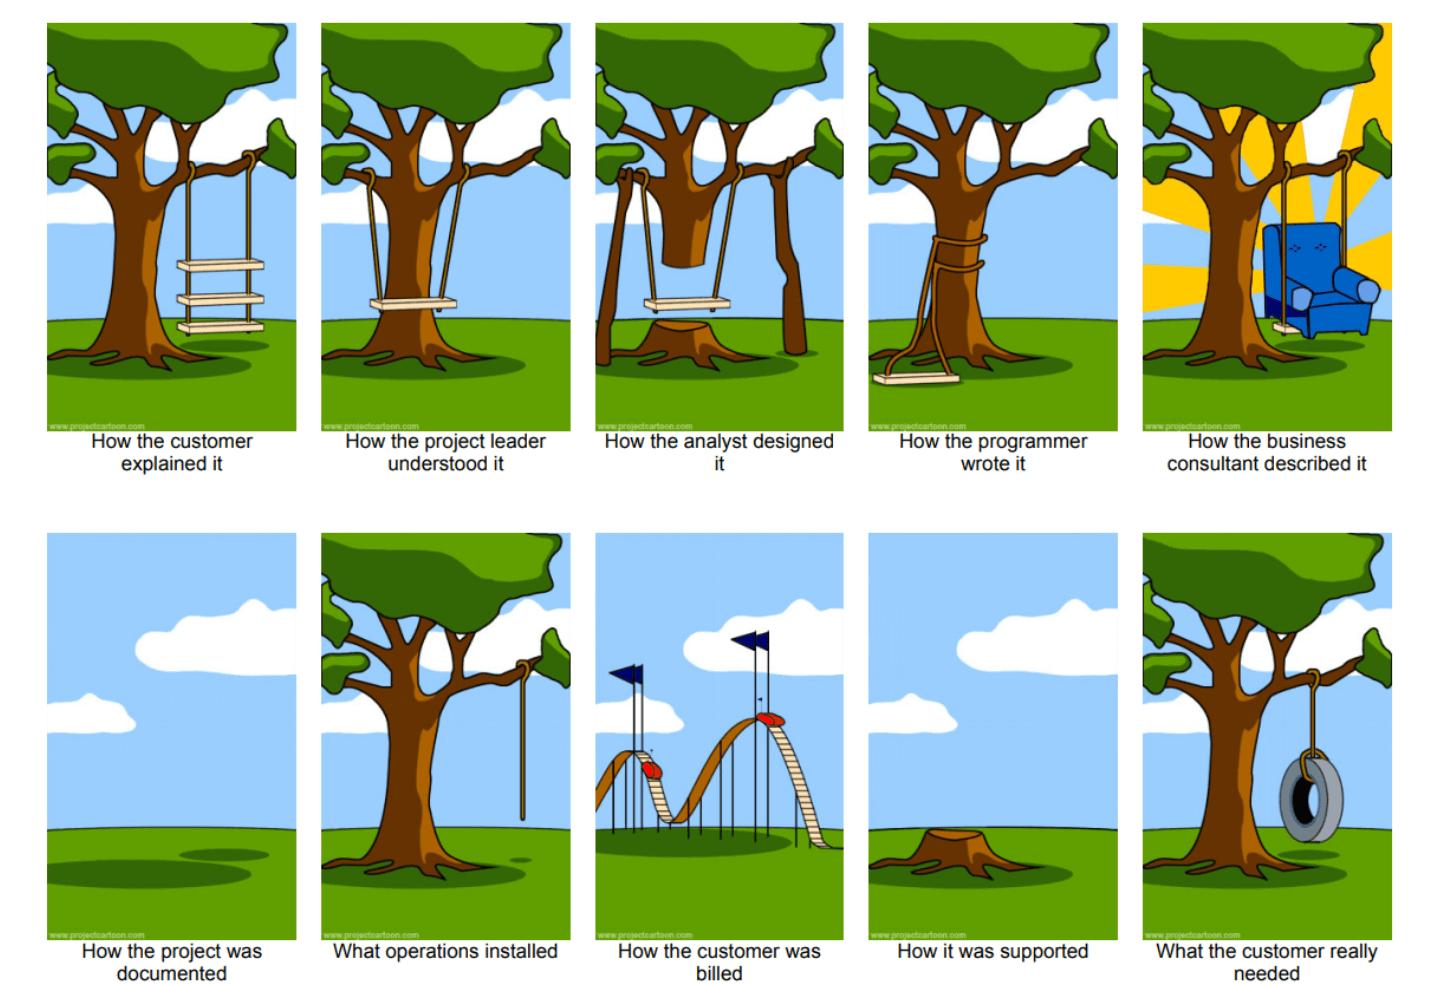 cartoon describing value from customer's perspective